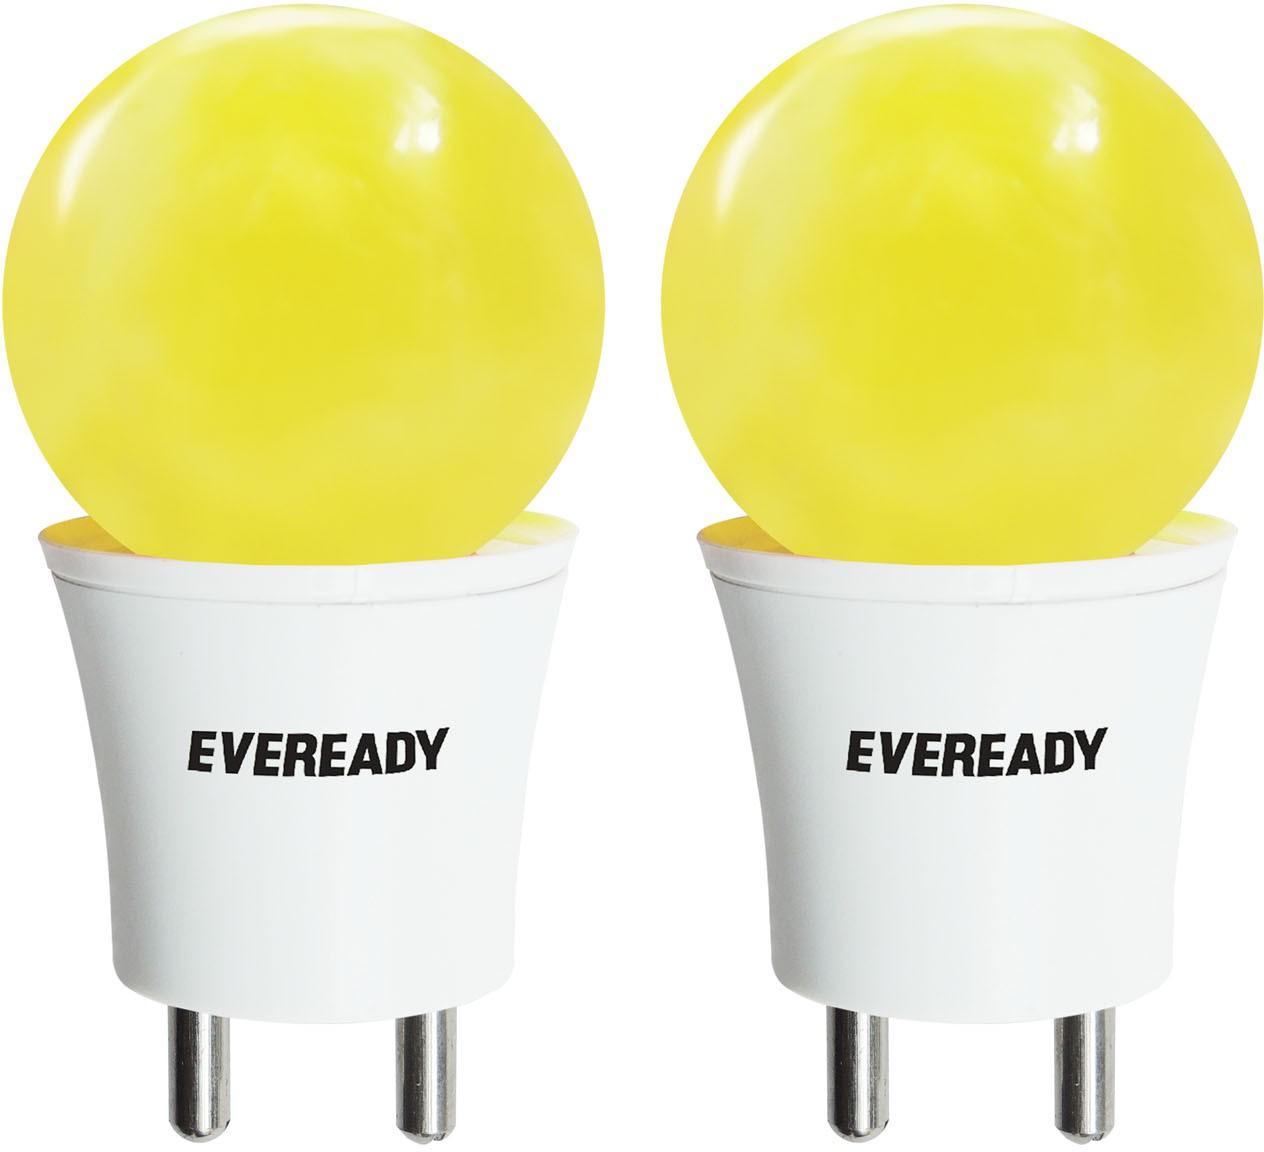 Flipkart - 0.5W Plug & Play LED Bulbs At just Rs.179